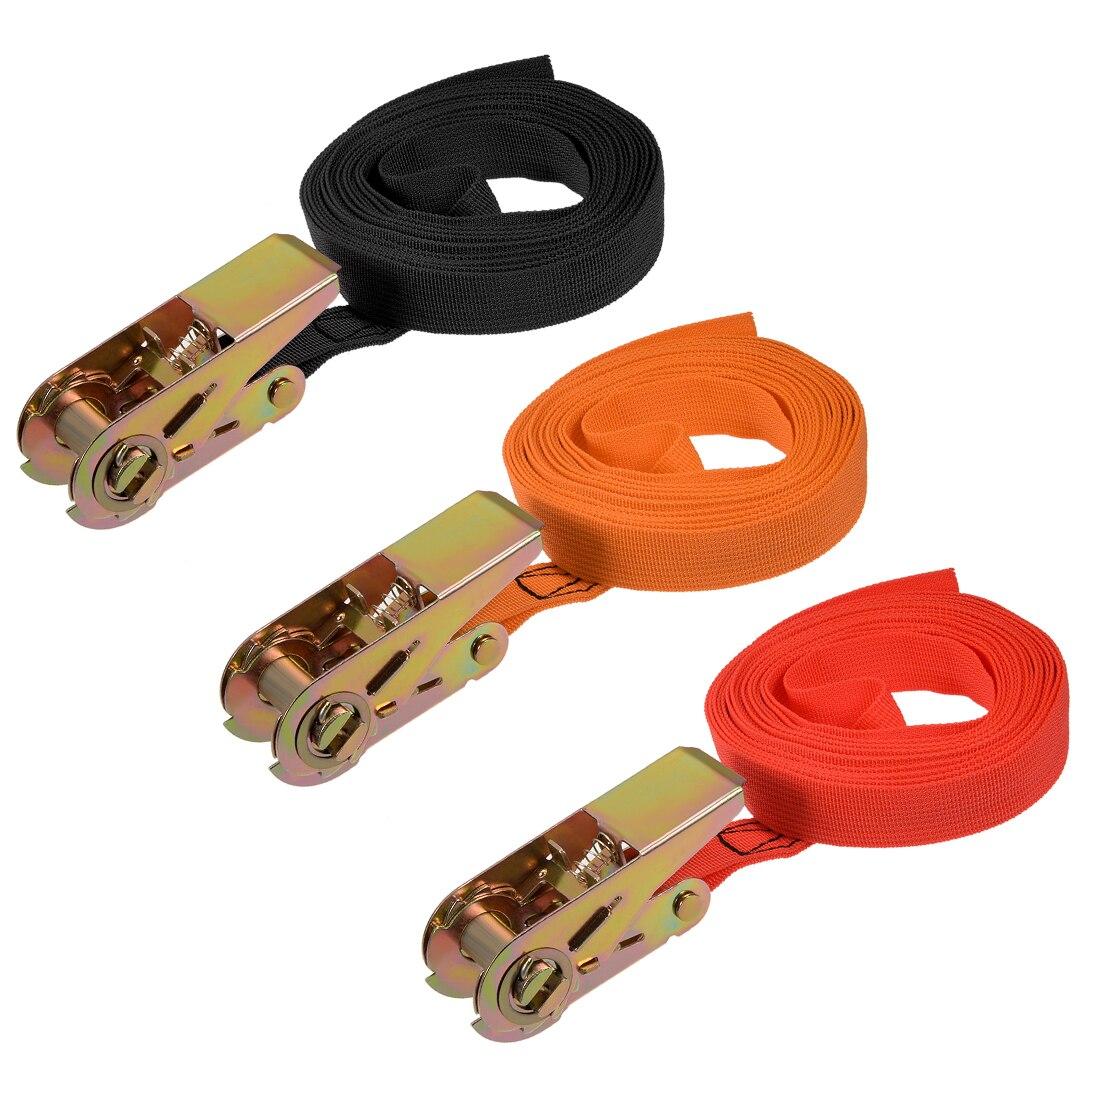 Uxcell 1pcs 25mm Width Ratchet Tie Down Strap Cargo Lashing Straps Up To 250Kg Long 4.5M 5M 5.5M 6M 7M 8M 9M 10M 5 Colors